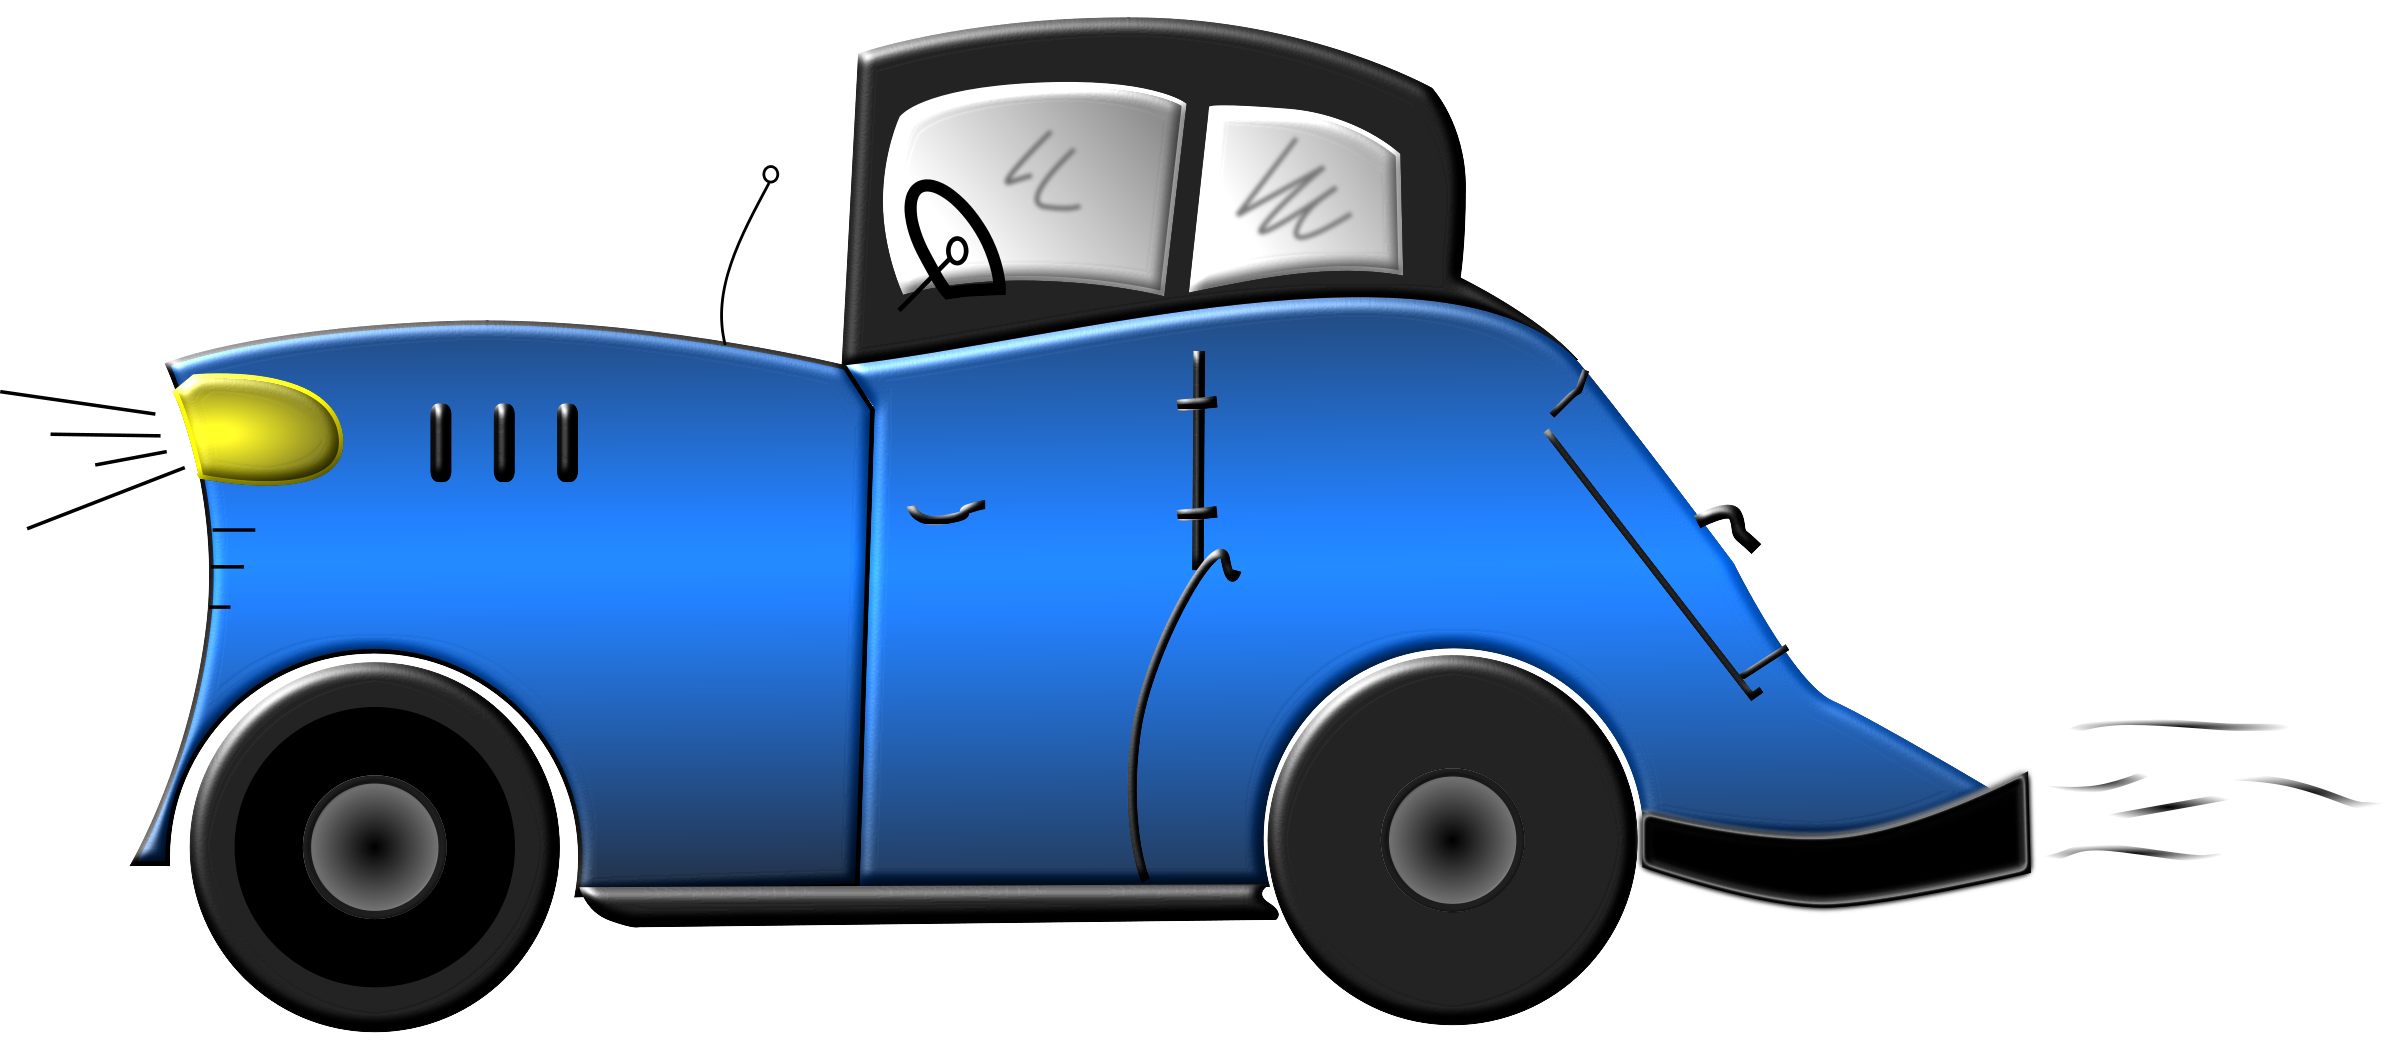 2400x1050 Cartoon Cars Pics